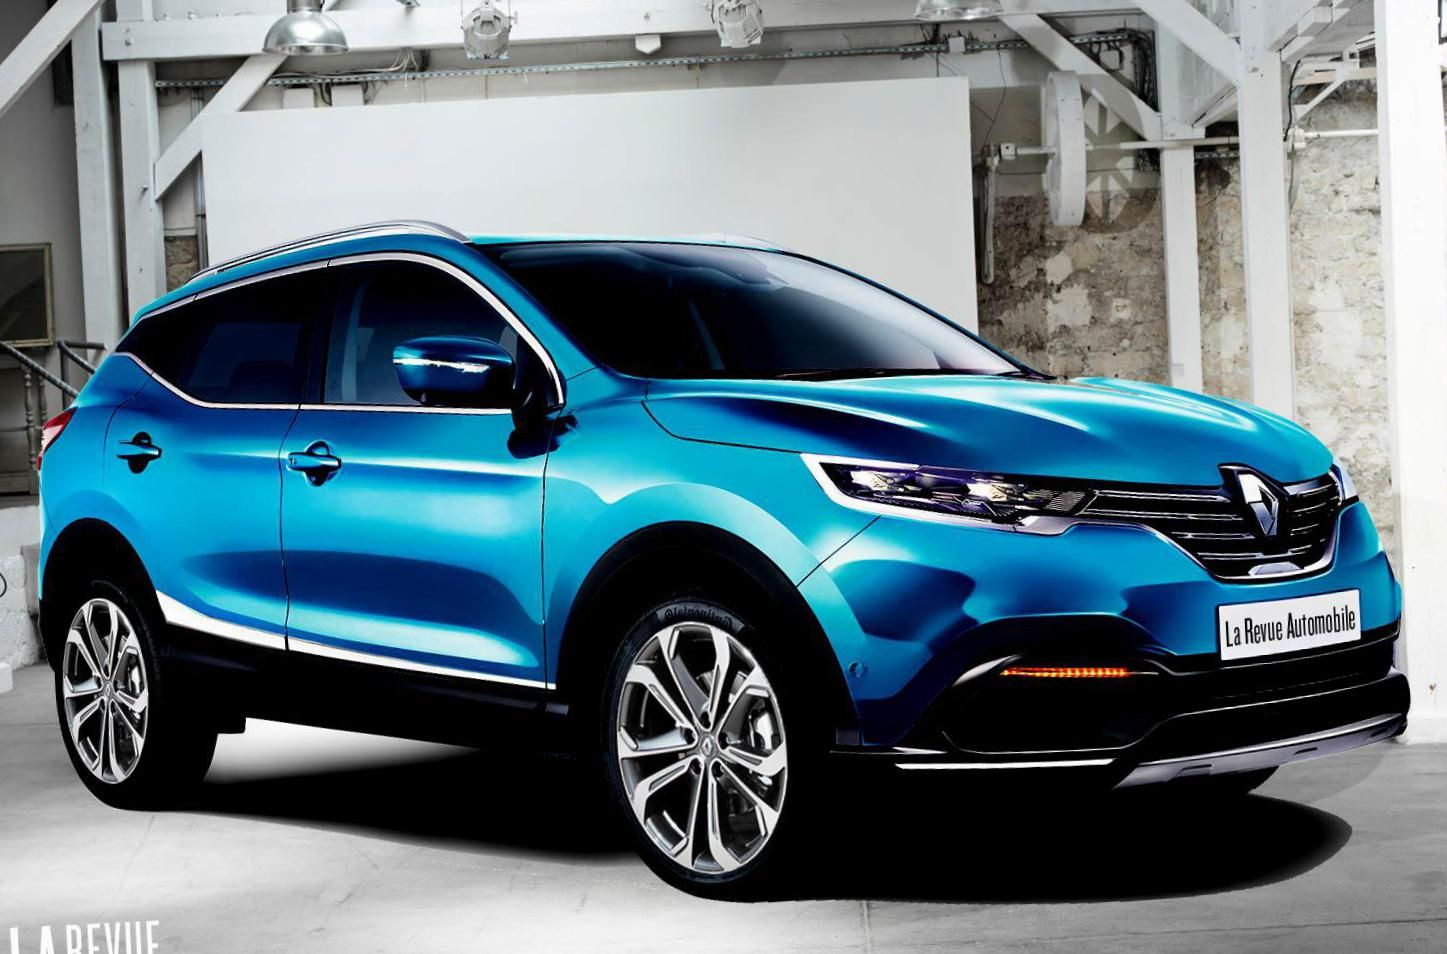 Renault Kadjar Tuning Http Autotras Com Car Renault New Renault